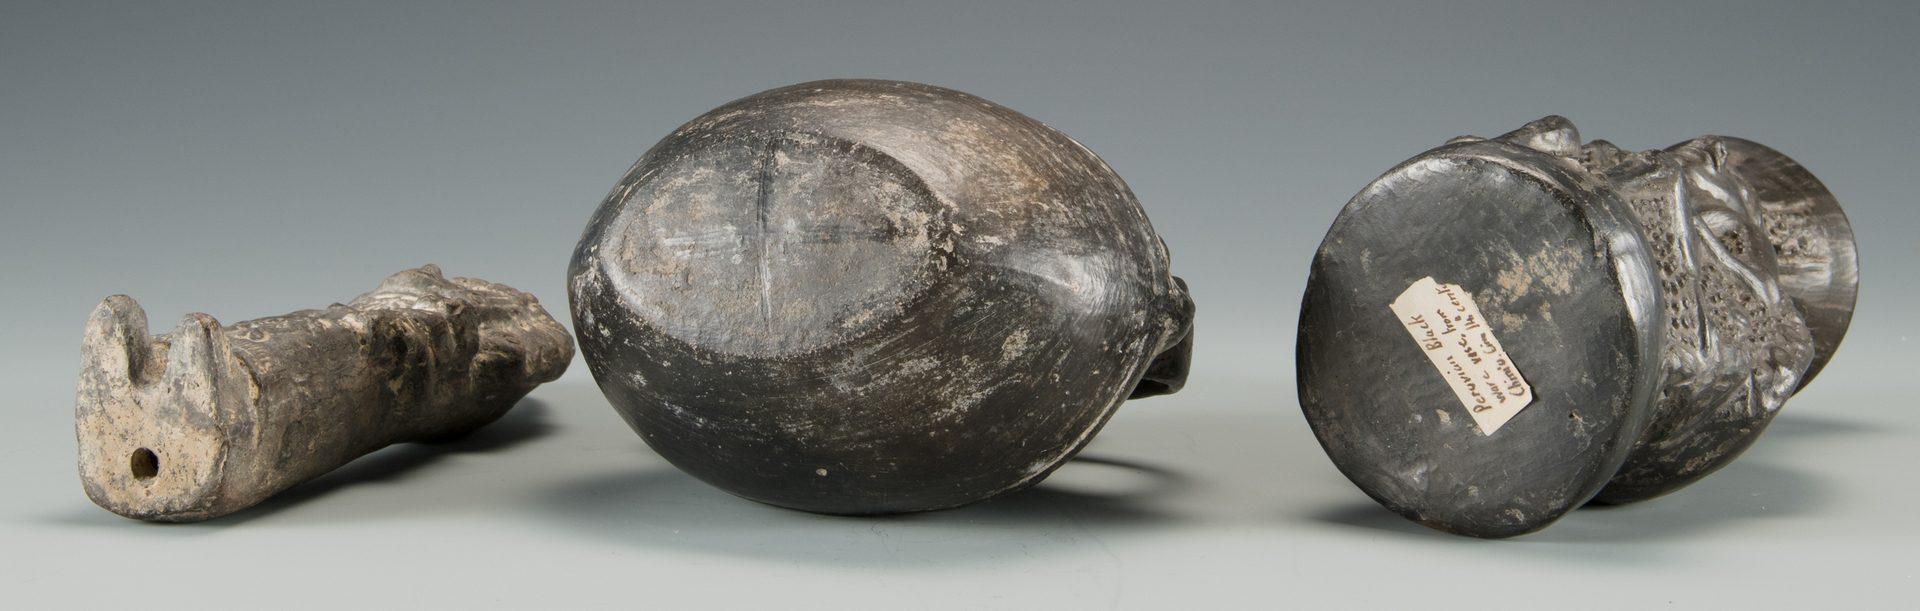 Lot 524: 3 Peruvian Chimu Blackware Pottery Items